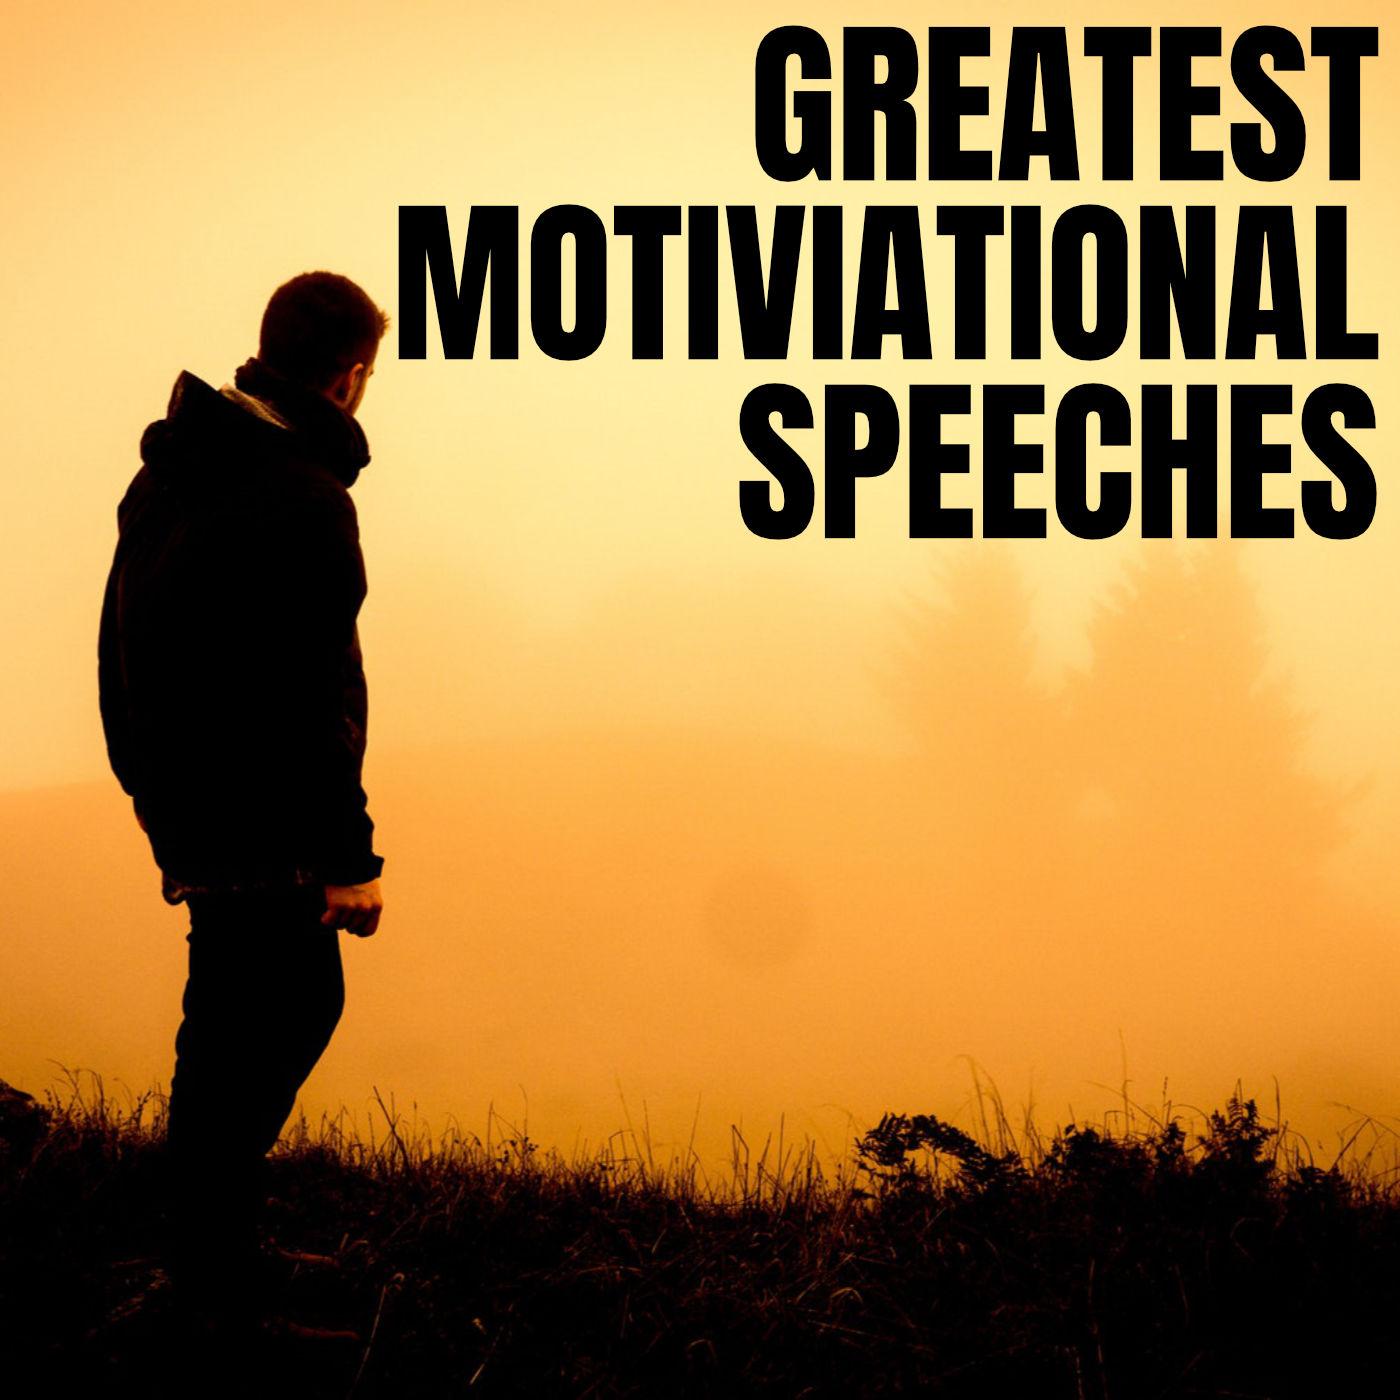 Greatest Motivational and Inspirational Speeches Ever:Duke Winslaw